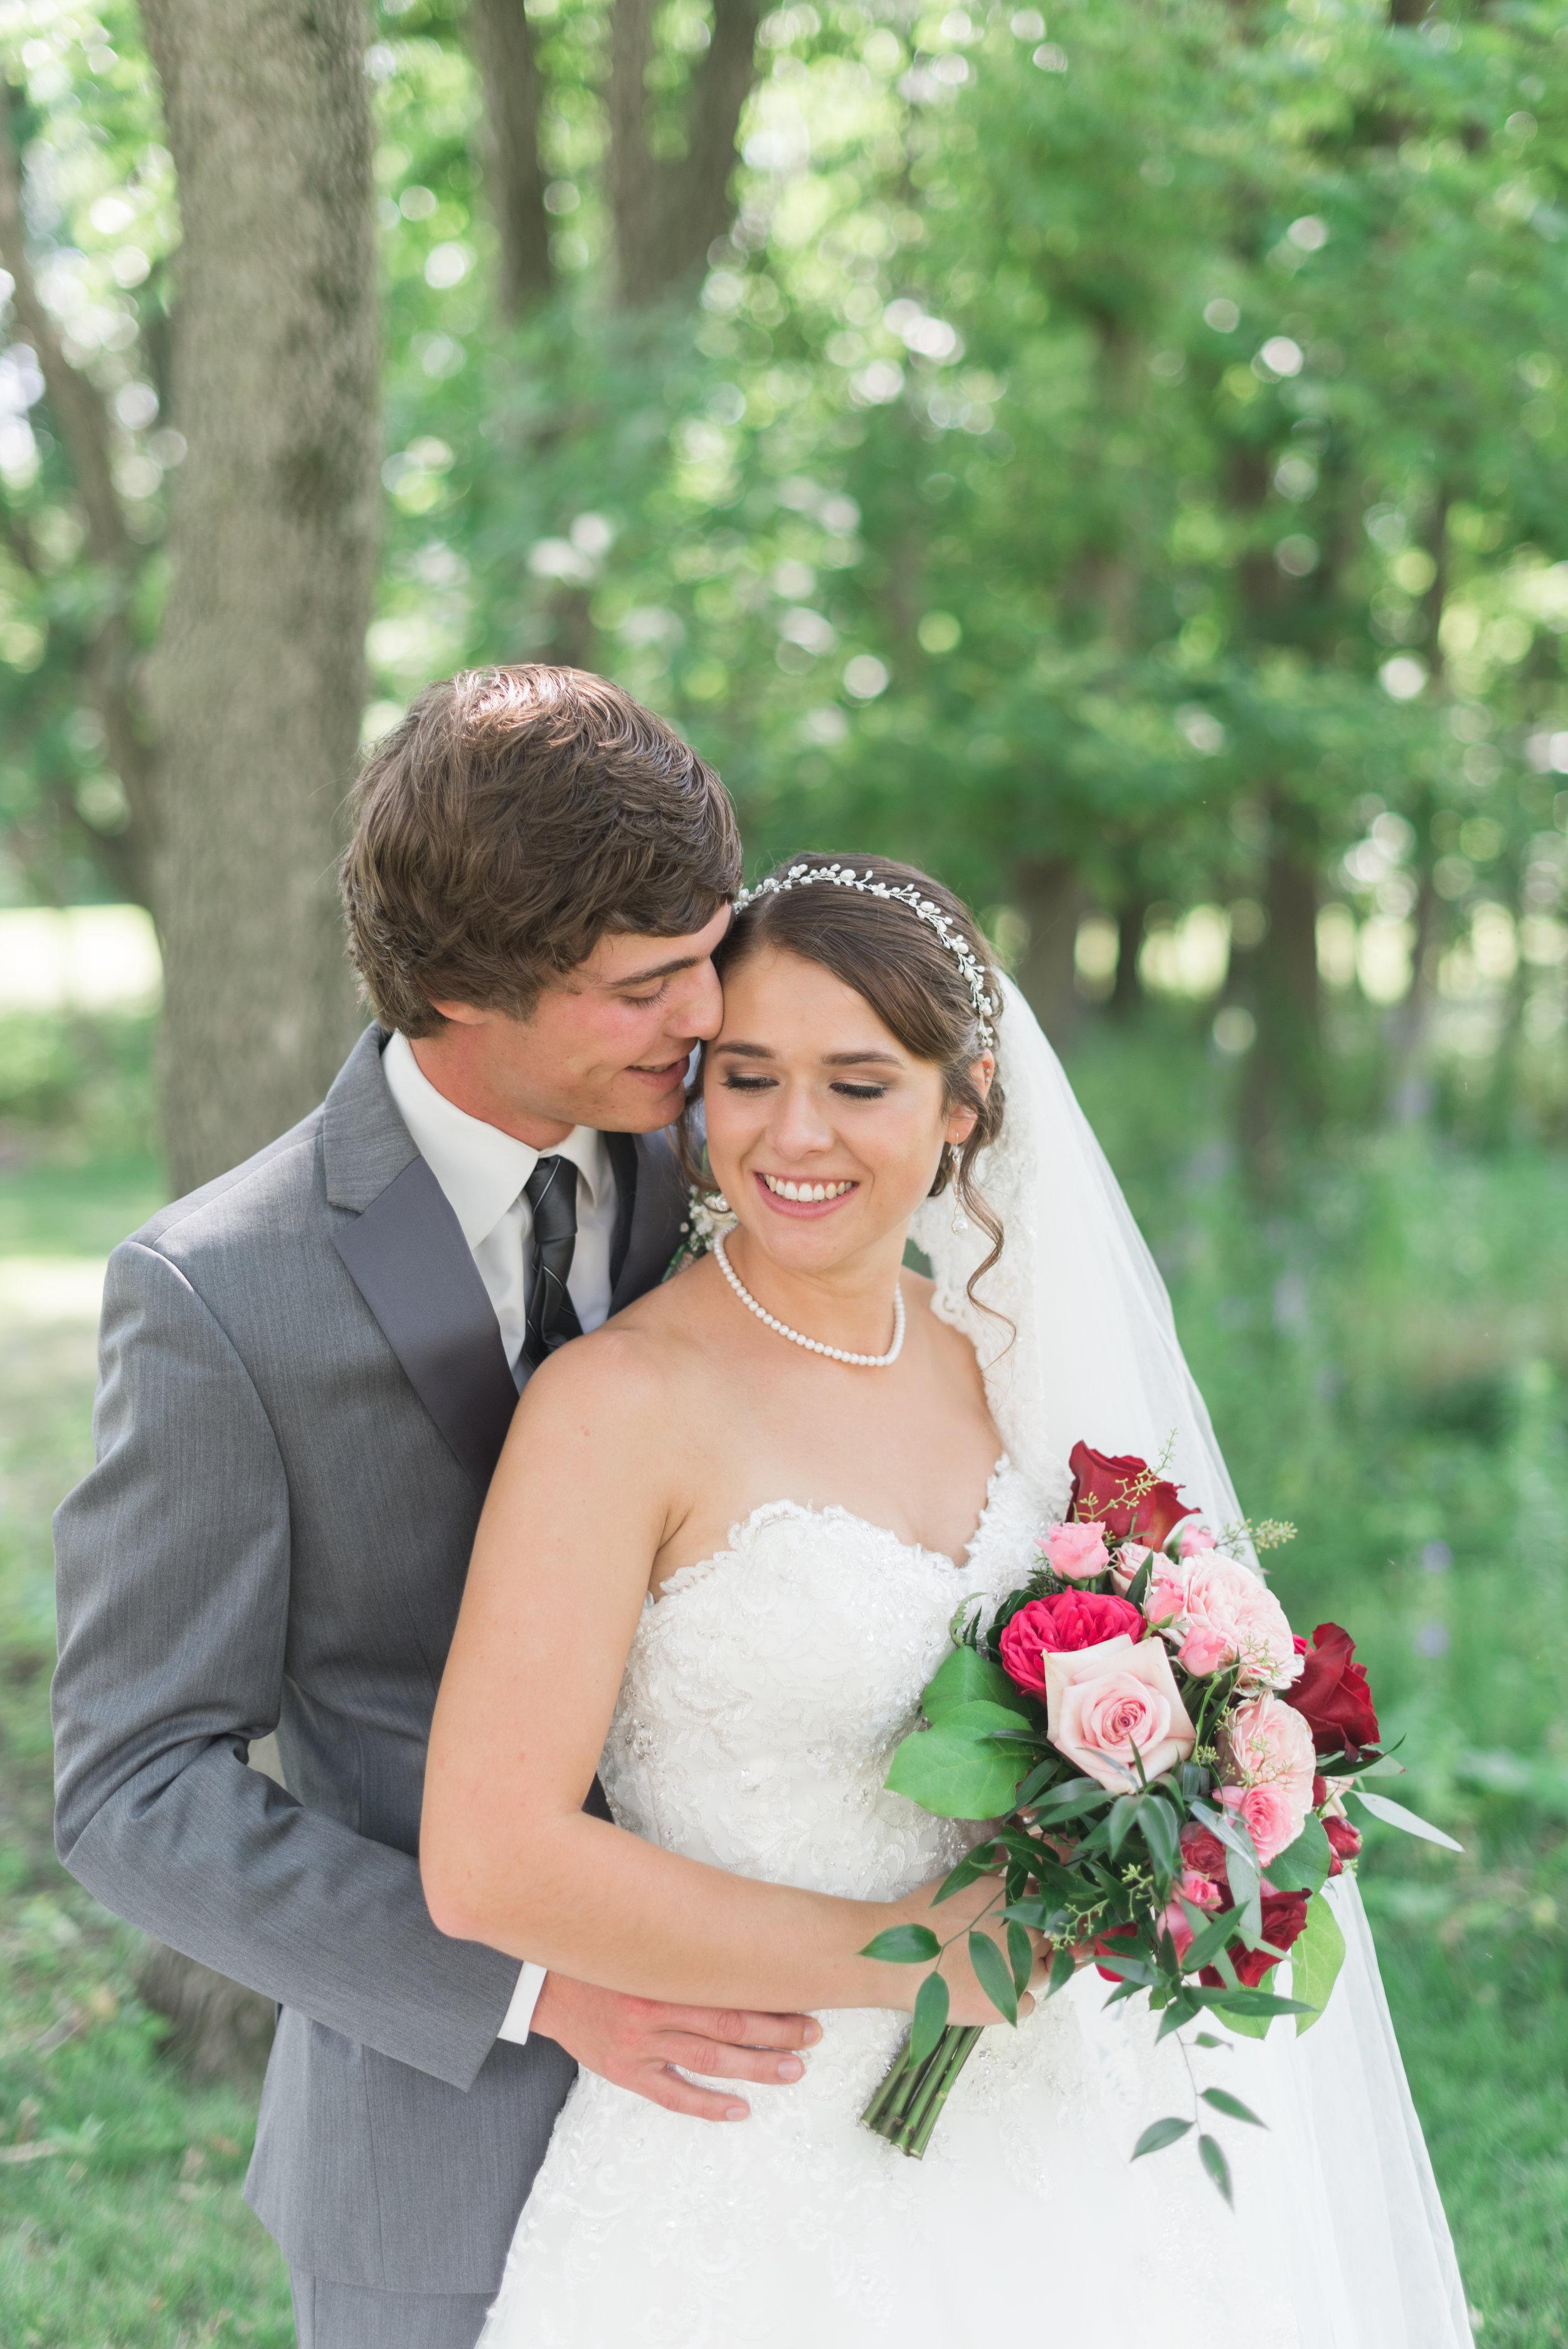 des moines Iowa wedding florist high end